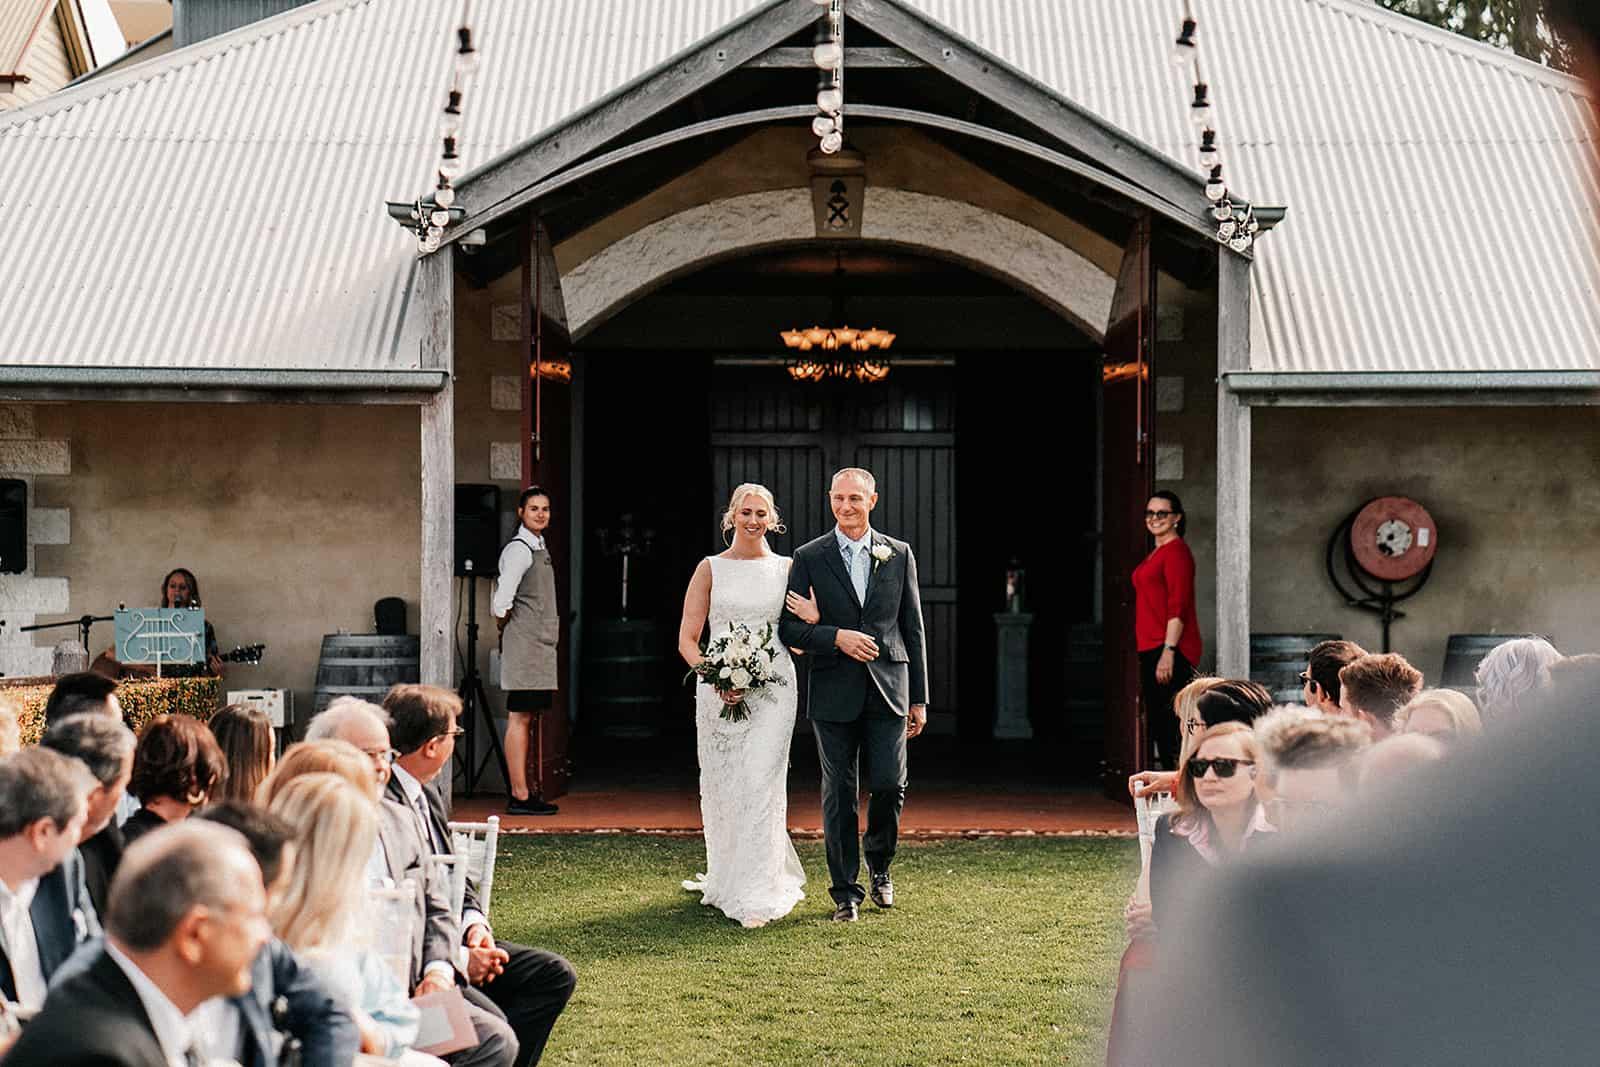 Flaxton gardens wedding celebrant